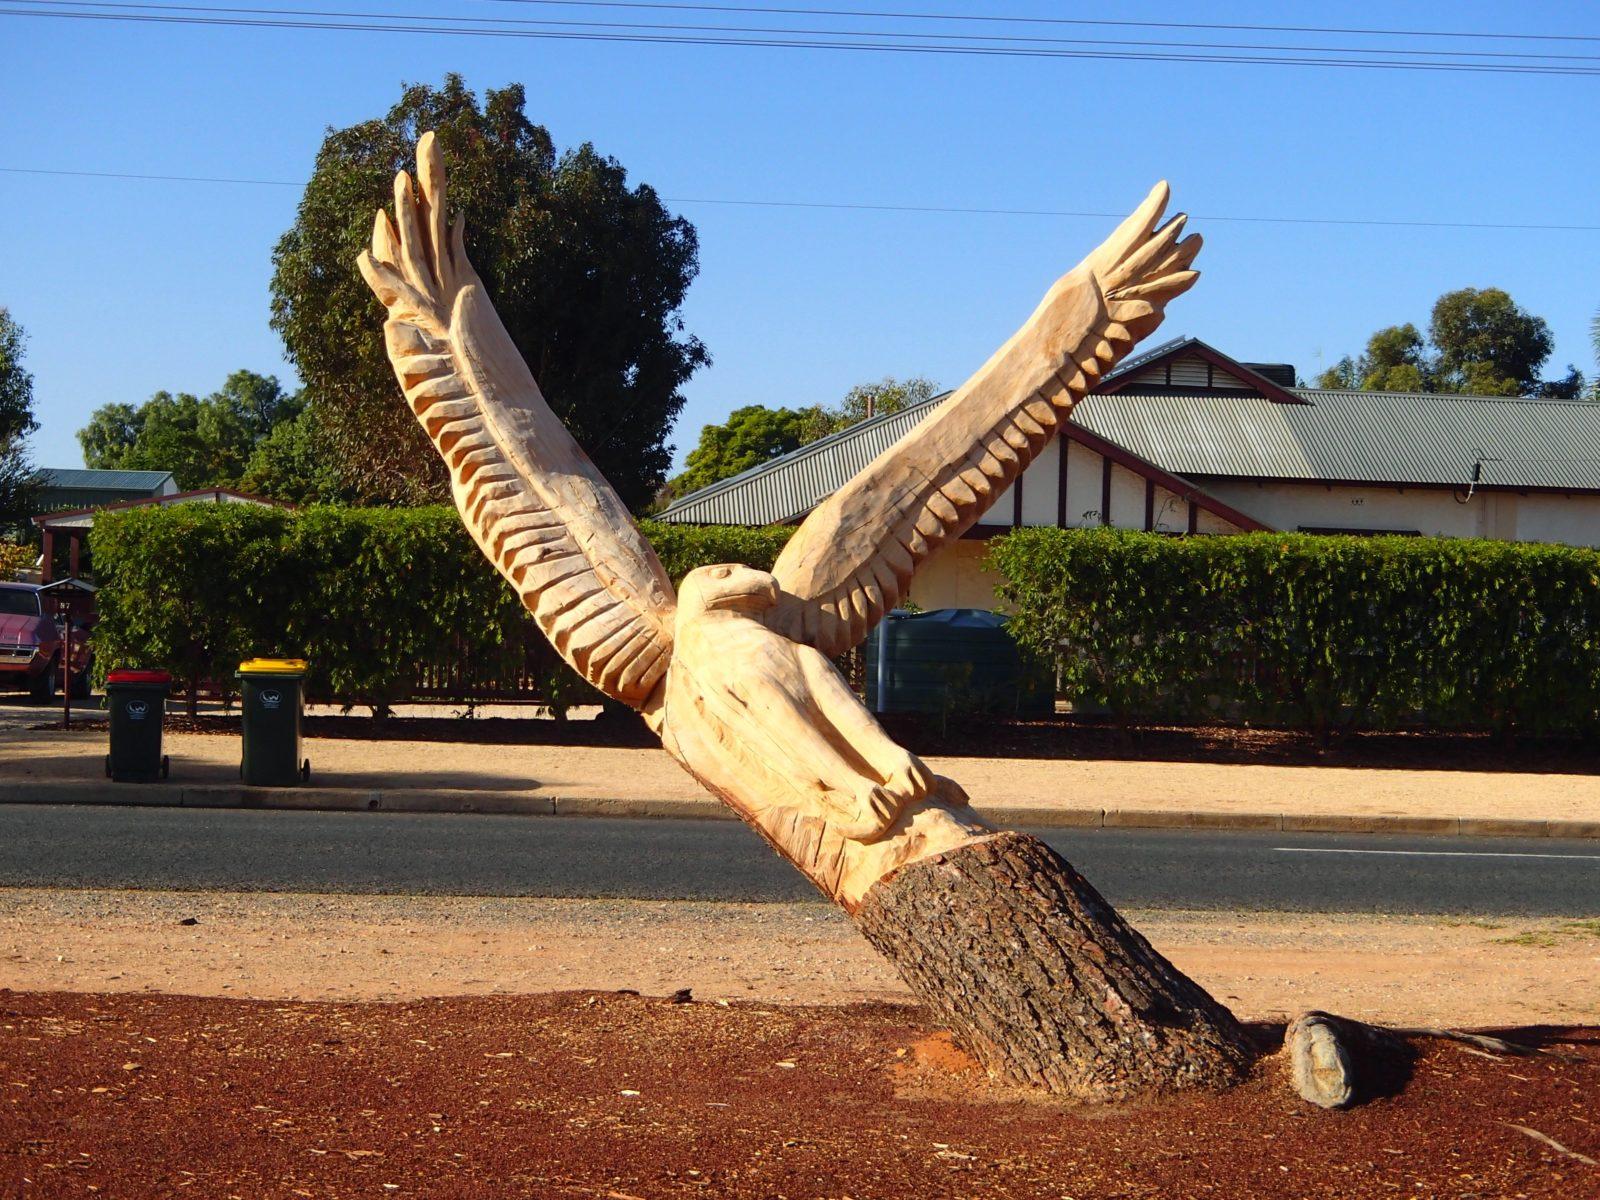 Eagle tree sculpture